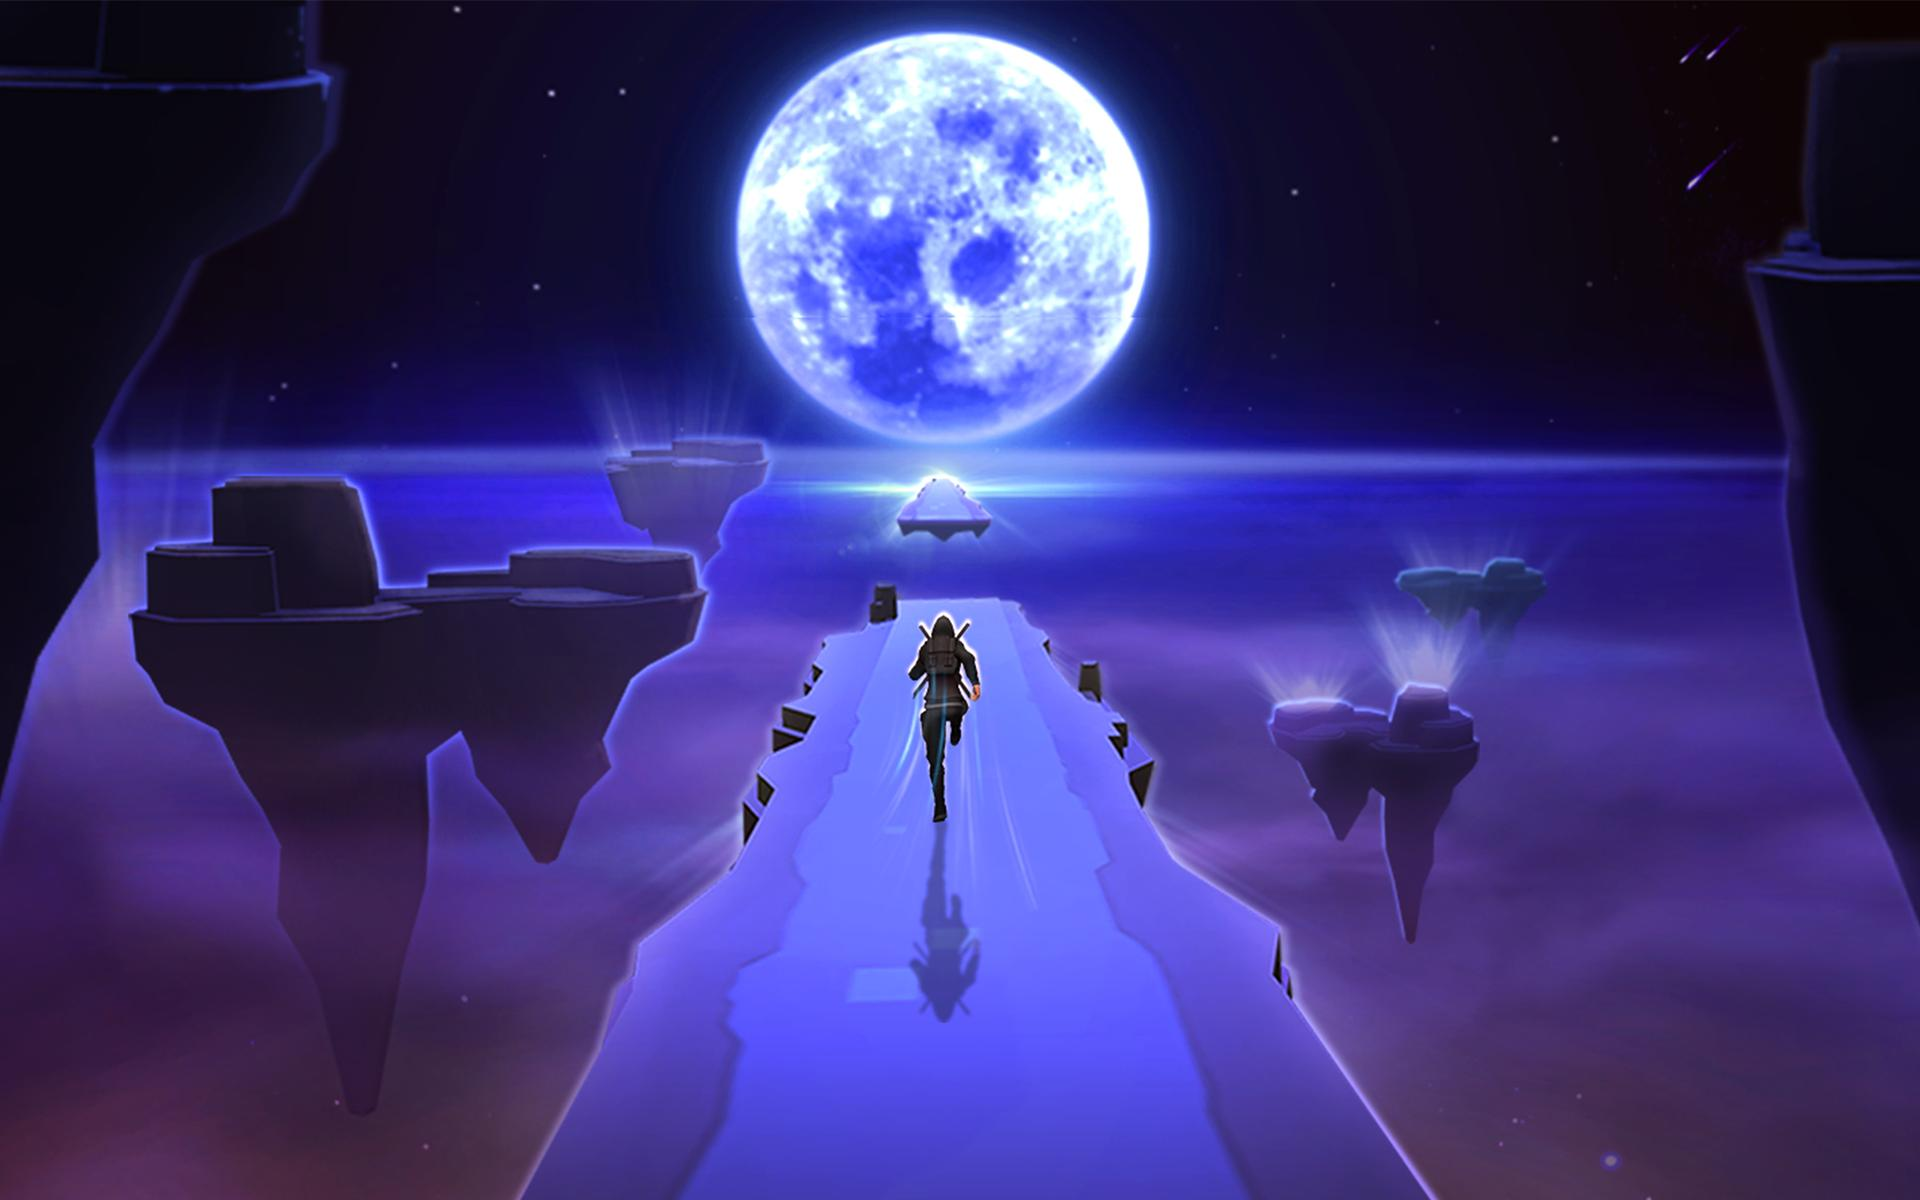 Sky Dancer Run - Running Game 4.2.0 Screenshot 22